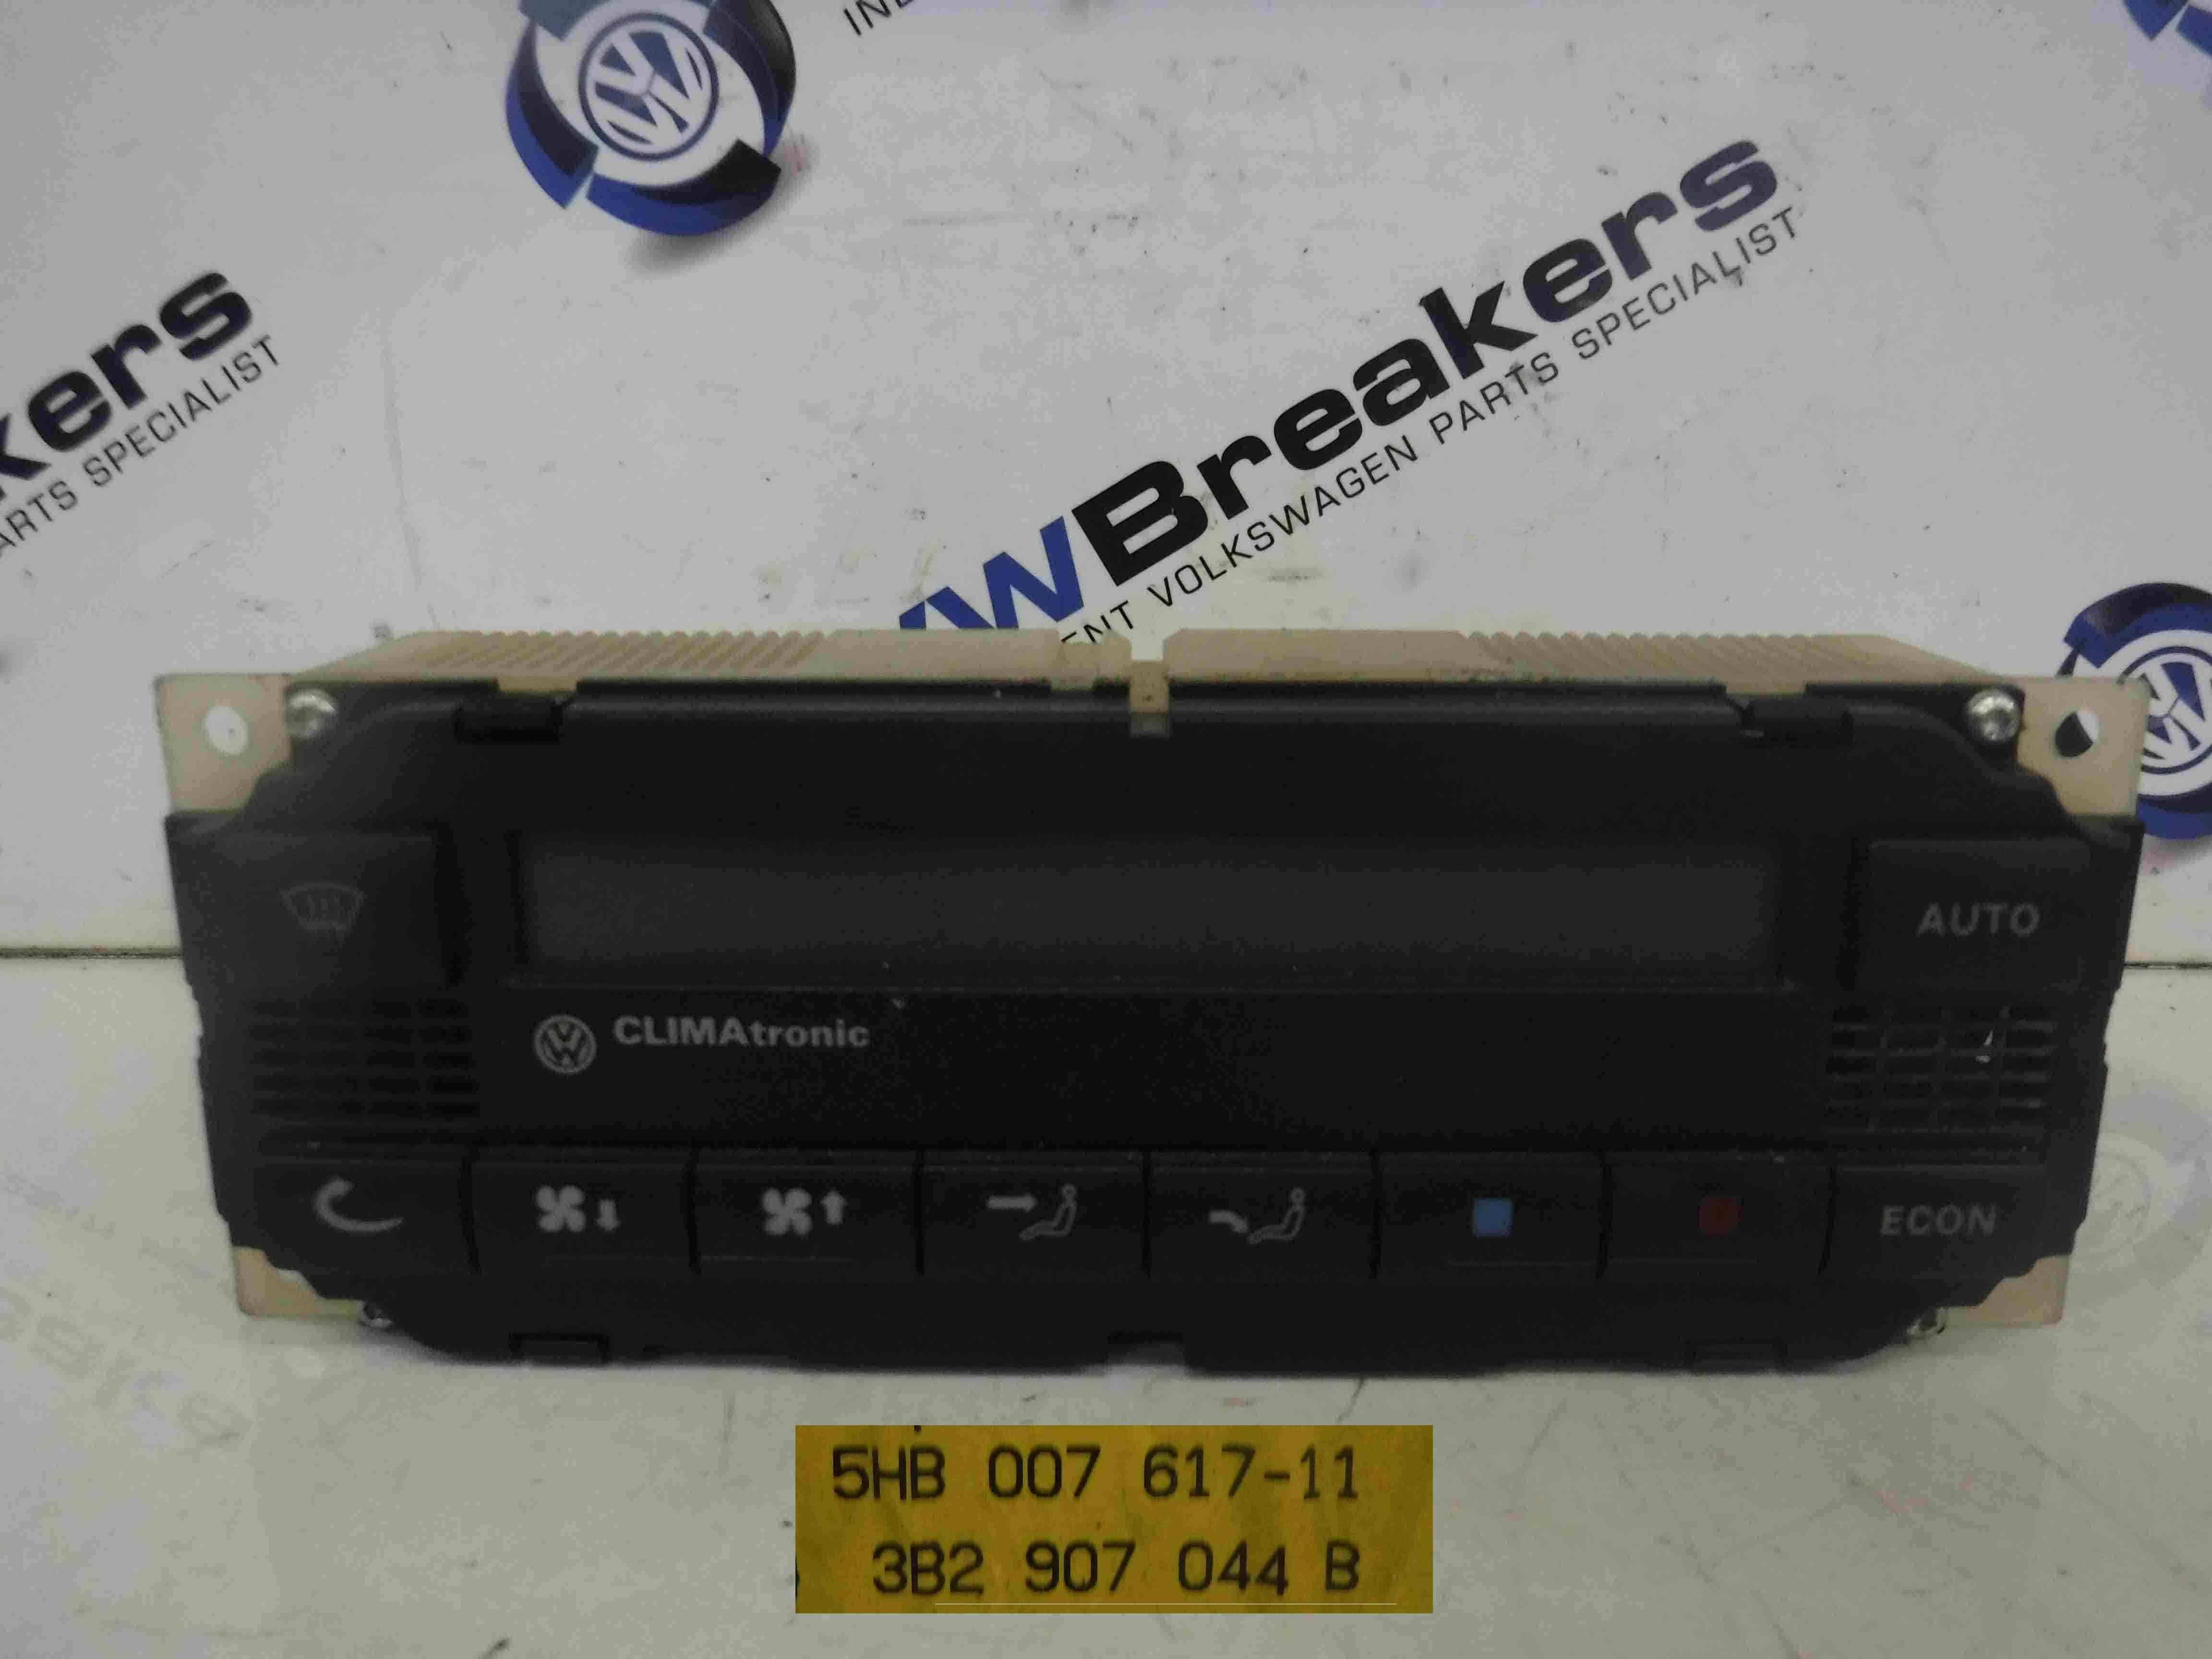 Volkswagen Golf 1997-2004 Heater Controls Climate Control Unit 5HB007617